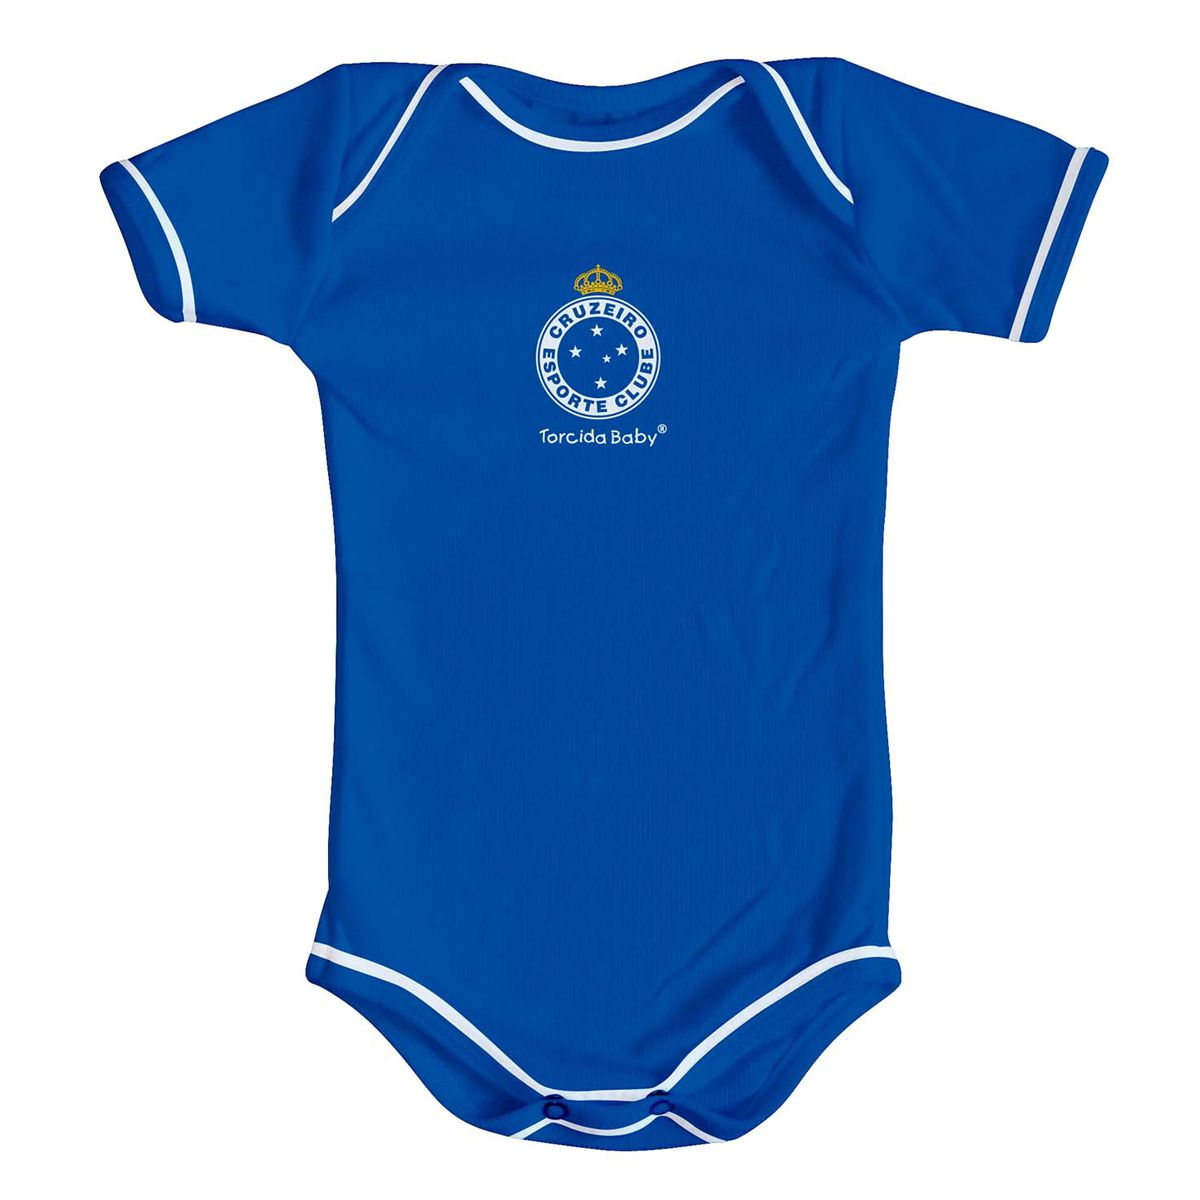 Kit Body + Pantufa para Bebê do Cruzeiro